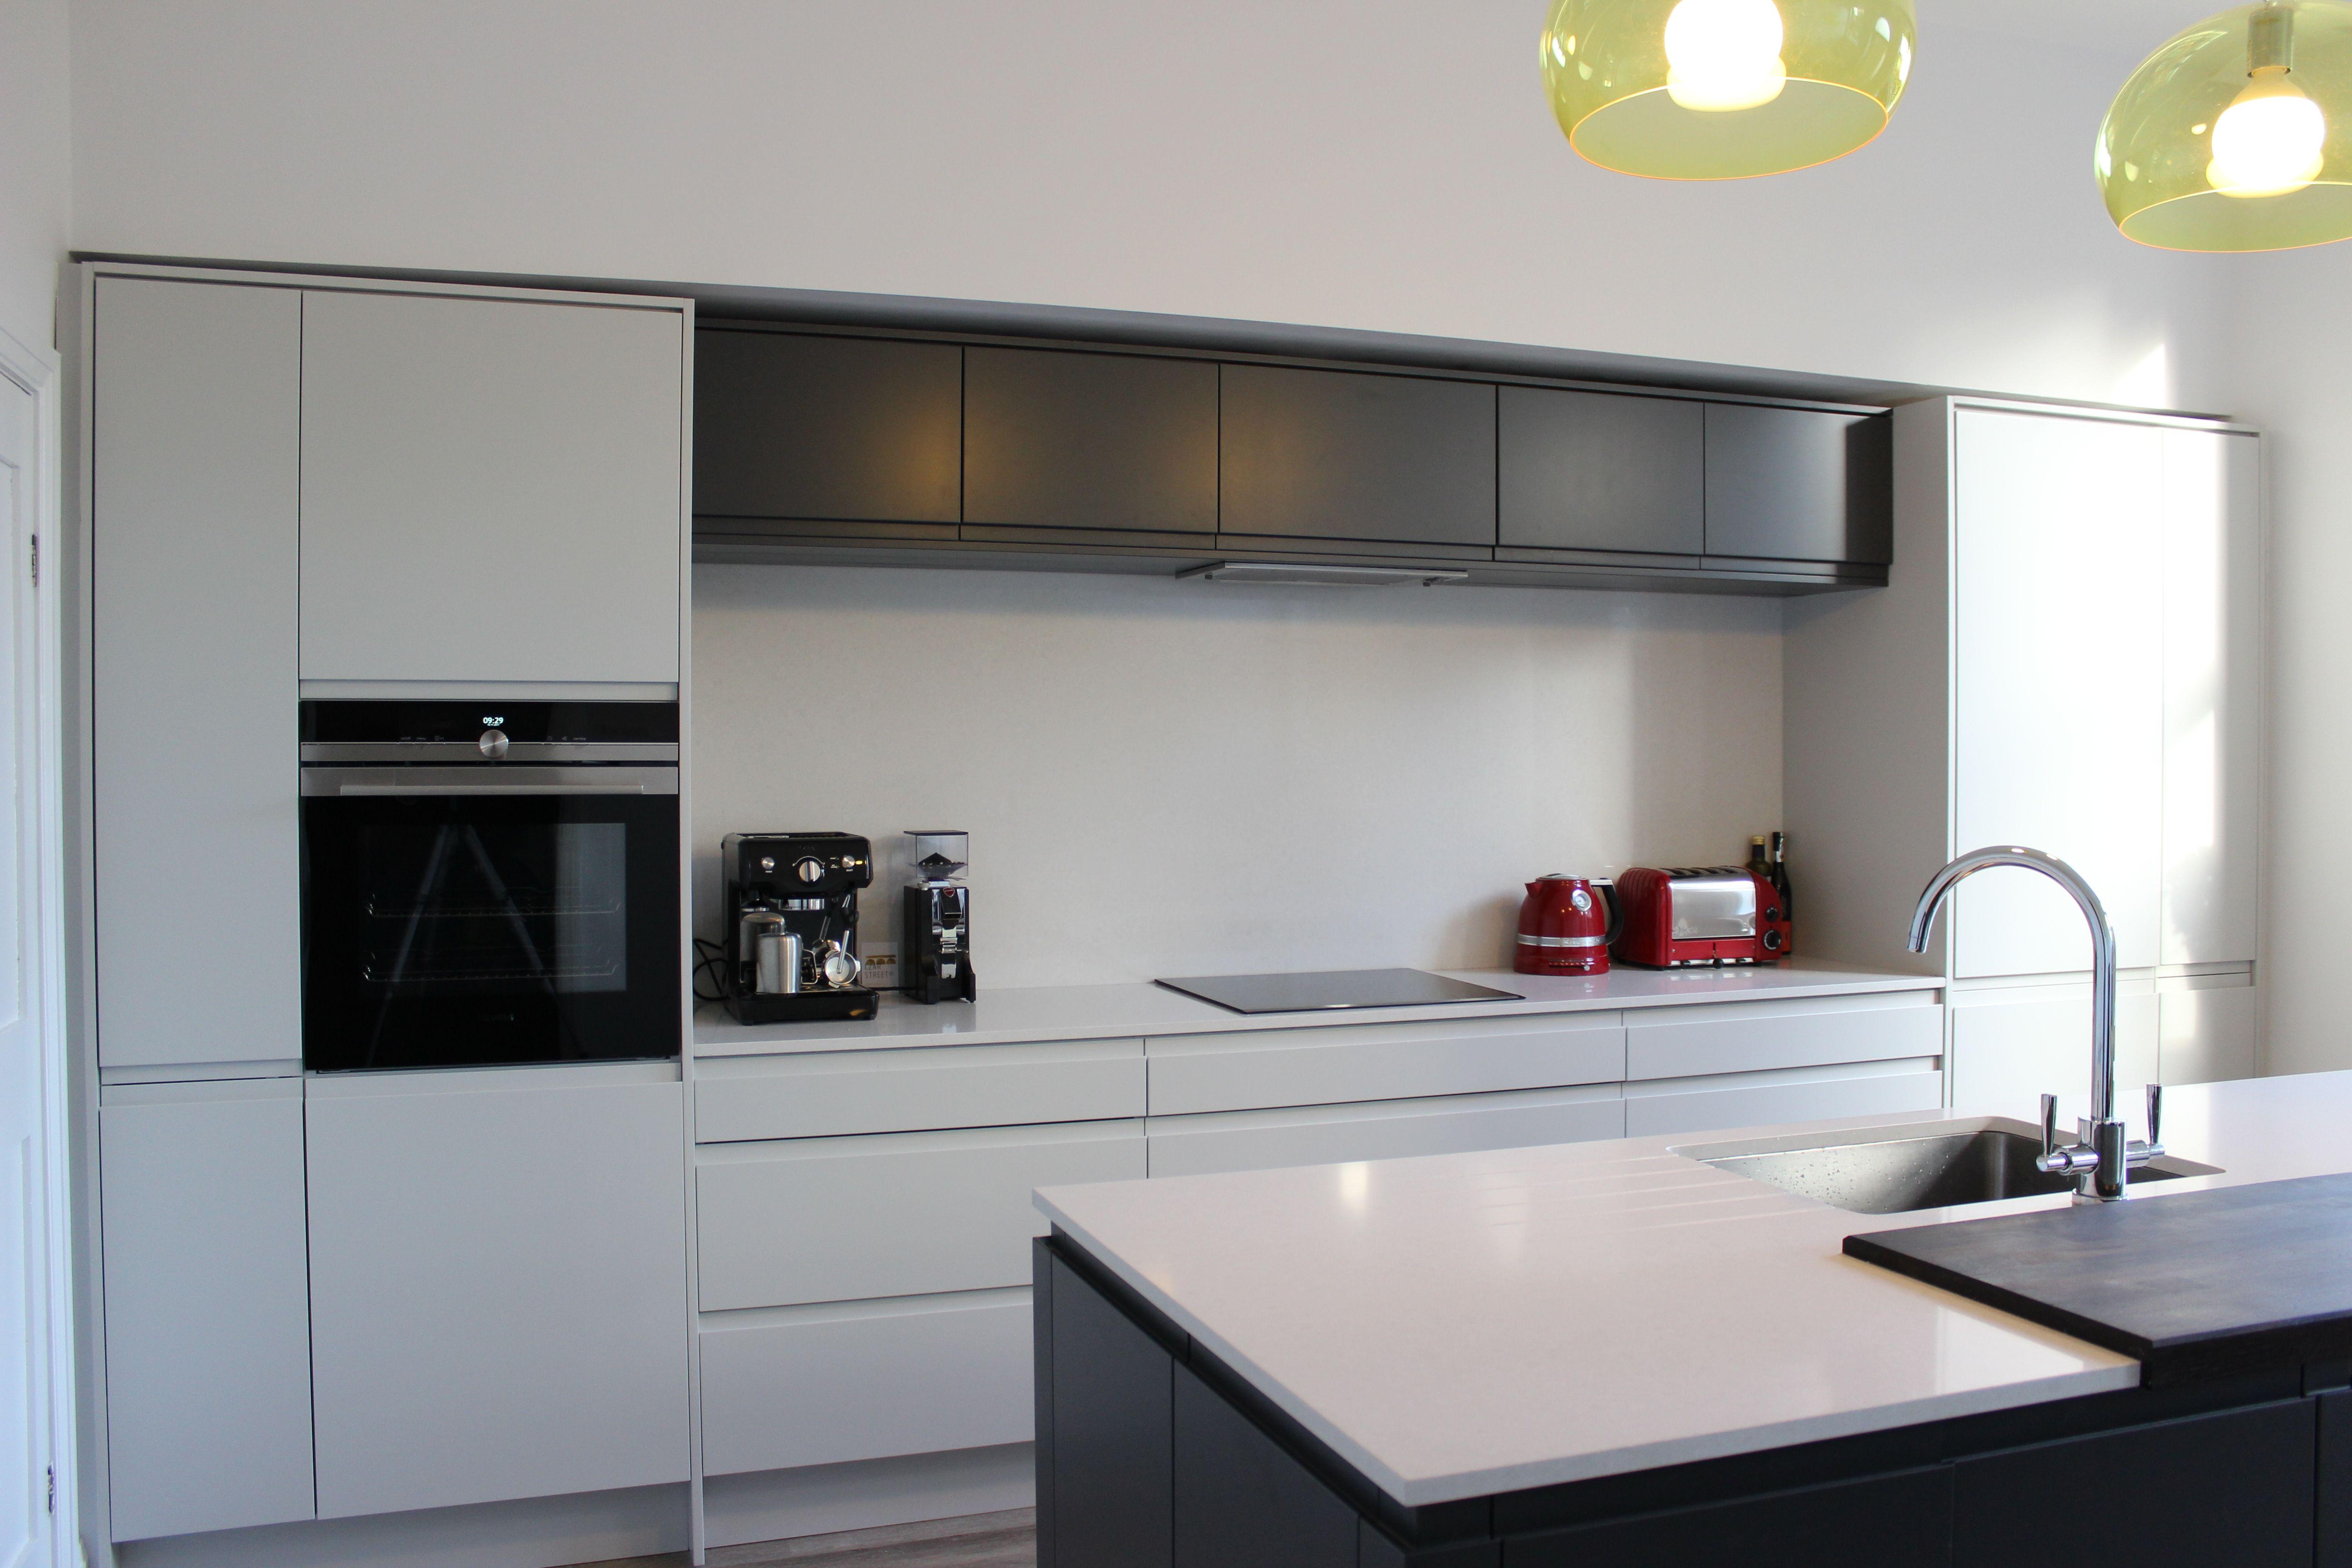 aj kitchen design. Aj Kitchen Design Zaragoza  Fantastic Sketch Cabinets Ideas